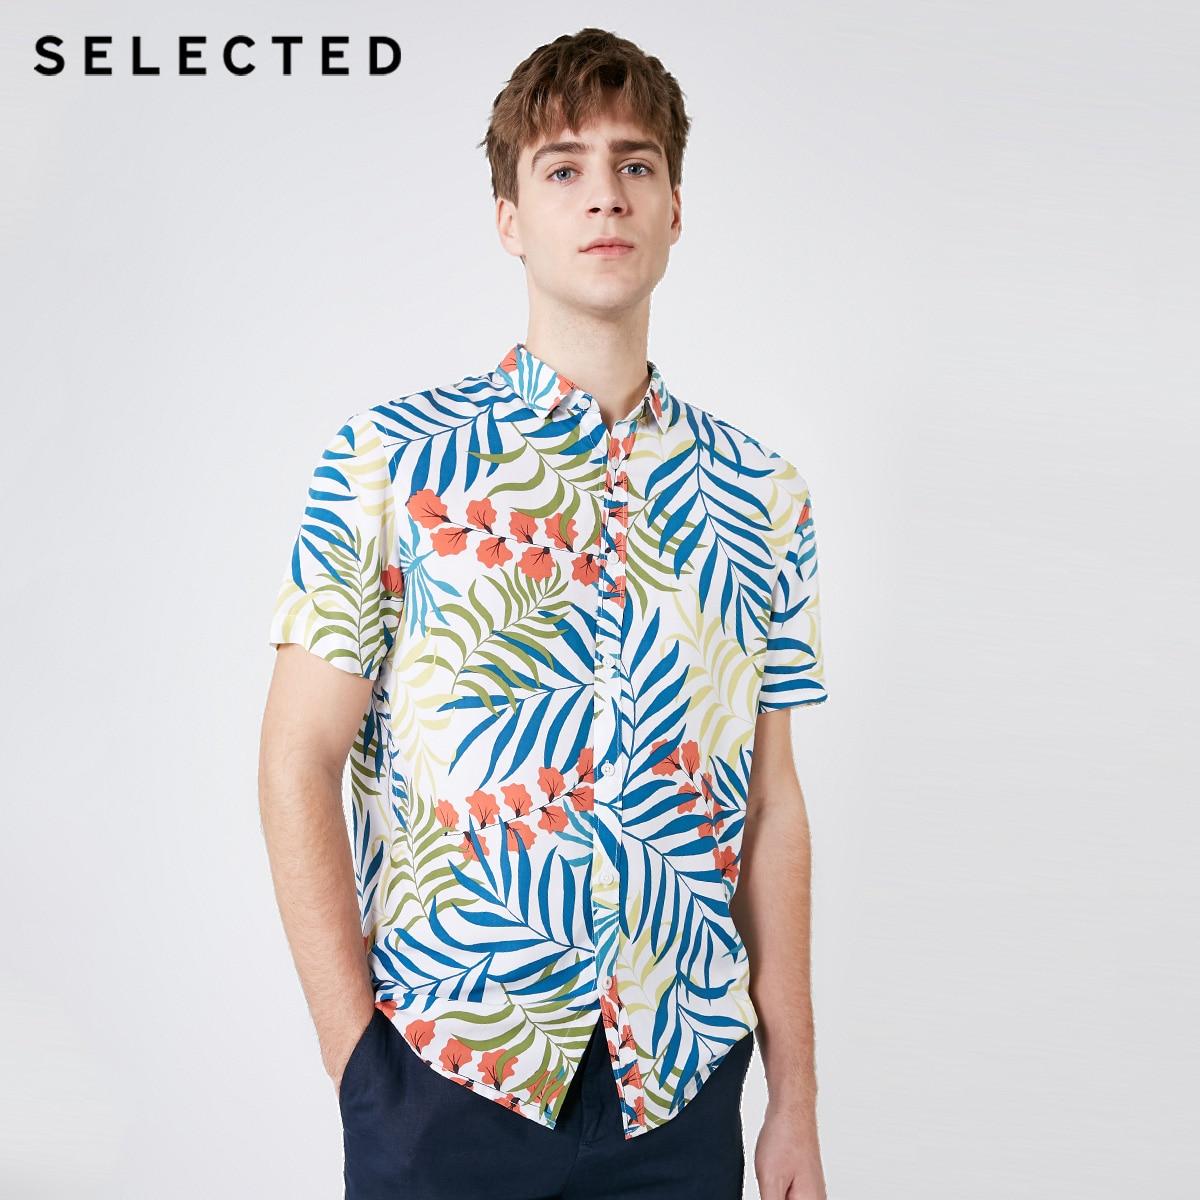 SELECTED Men's Loose Fit Printed Trend Short-sleeved Temperament Casual Shirt S|419204516